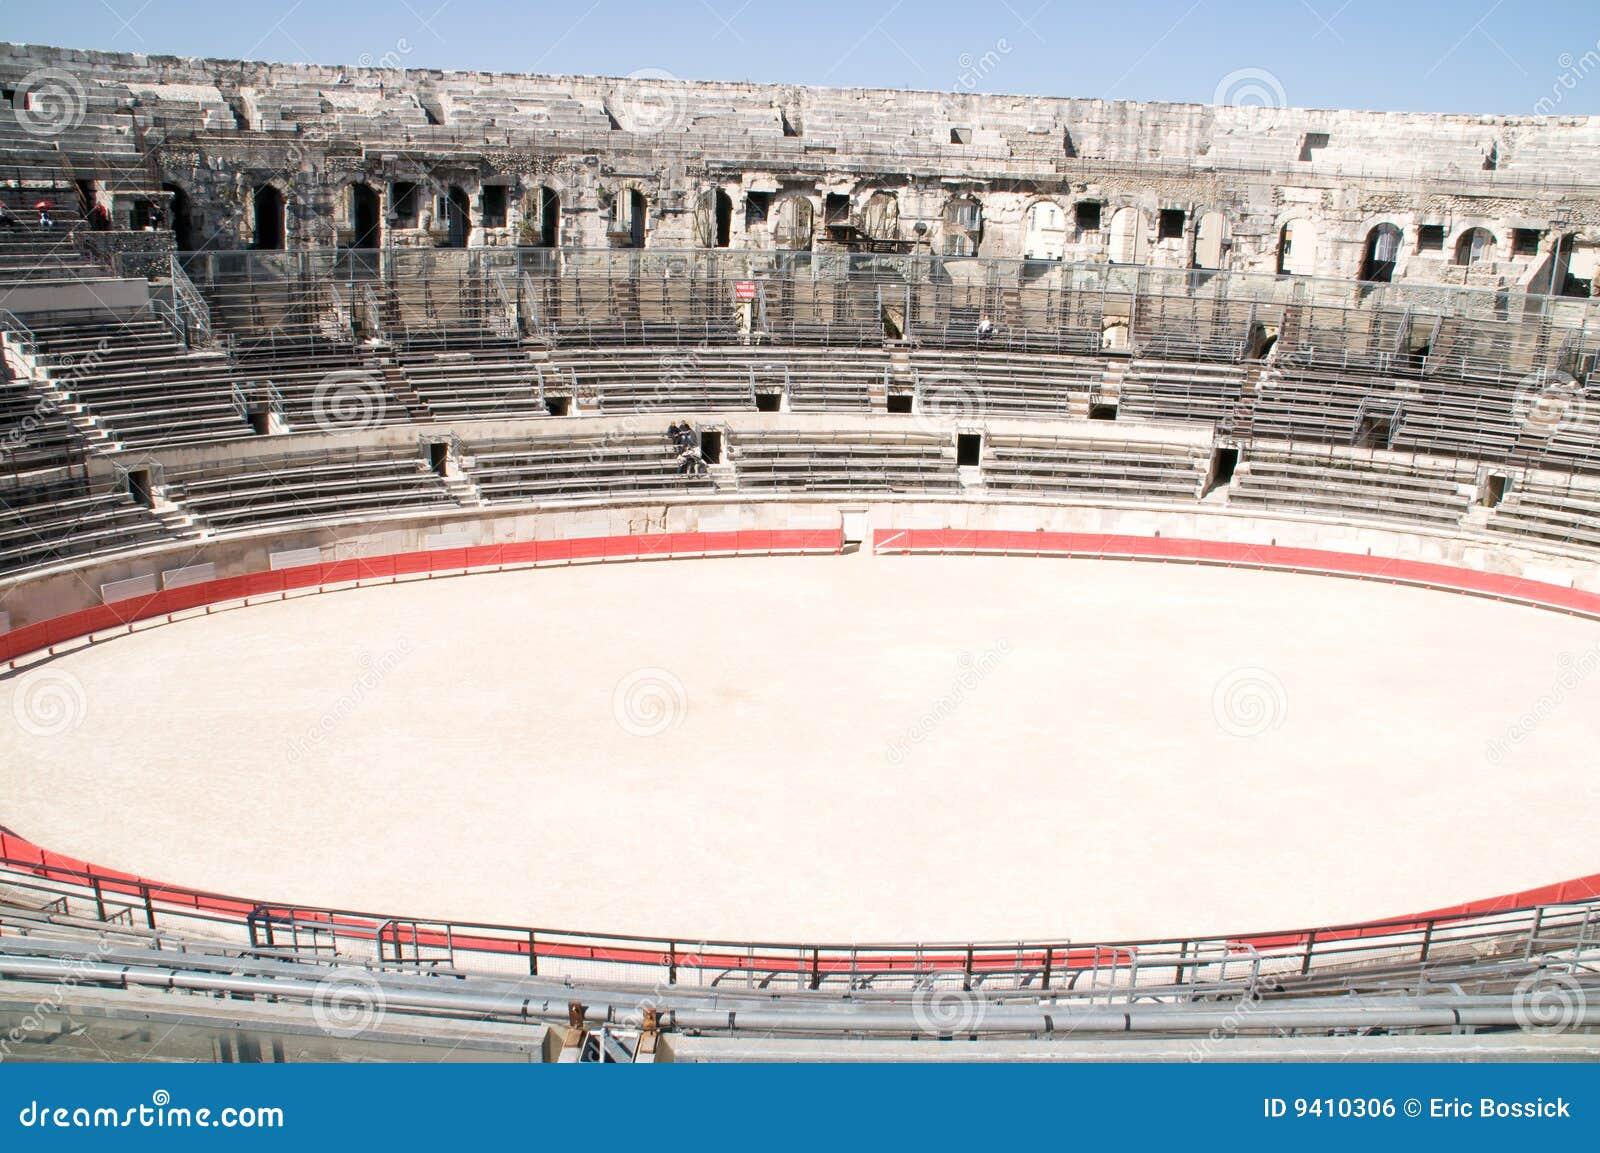 Interior of Roman arena in Nimes